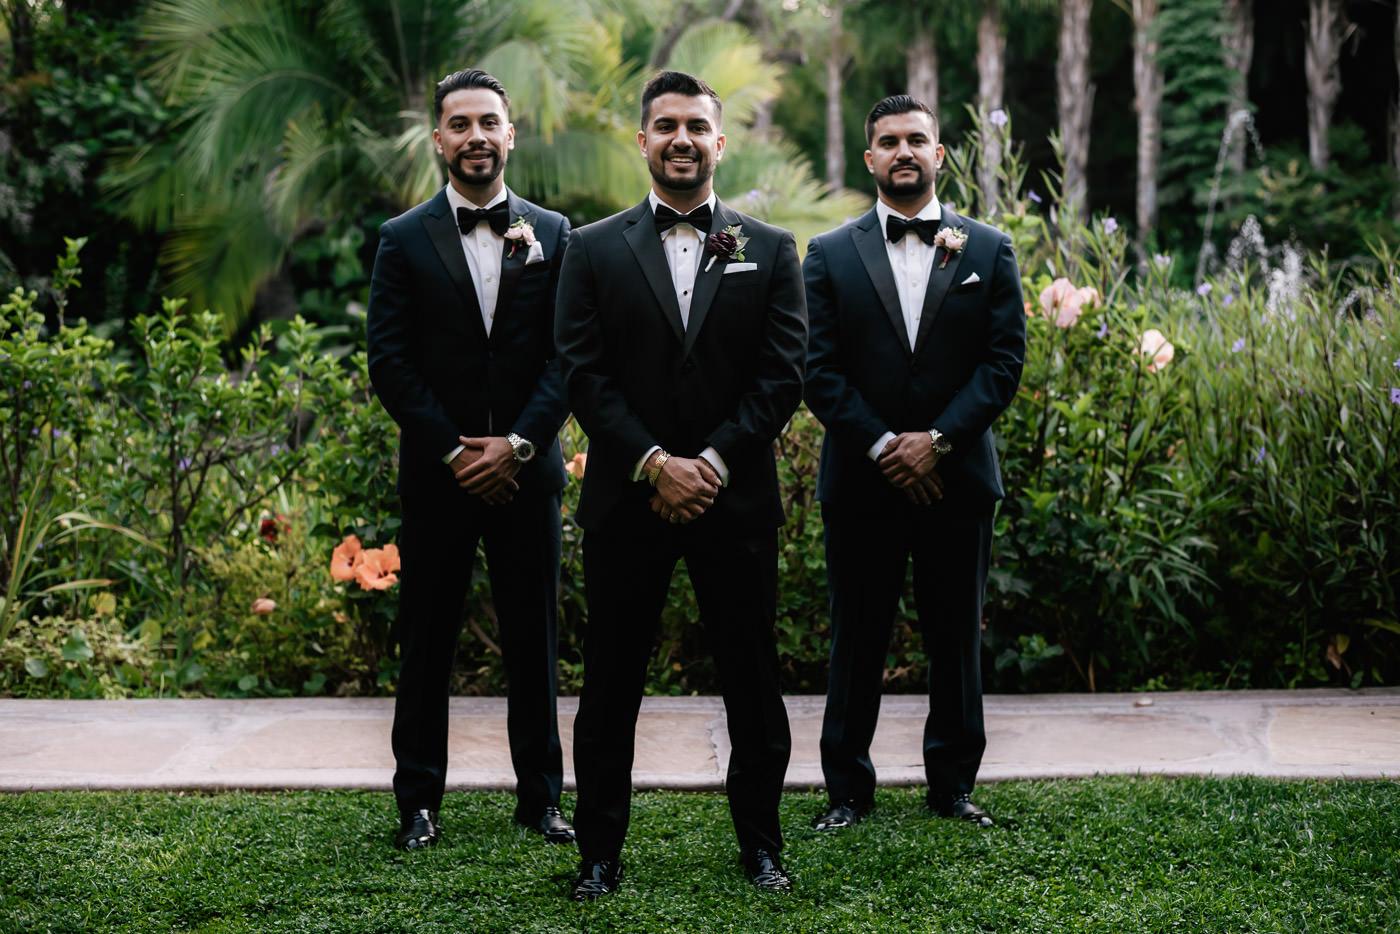 eden-gardens-wedding-photographer-romantic-62.jpg